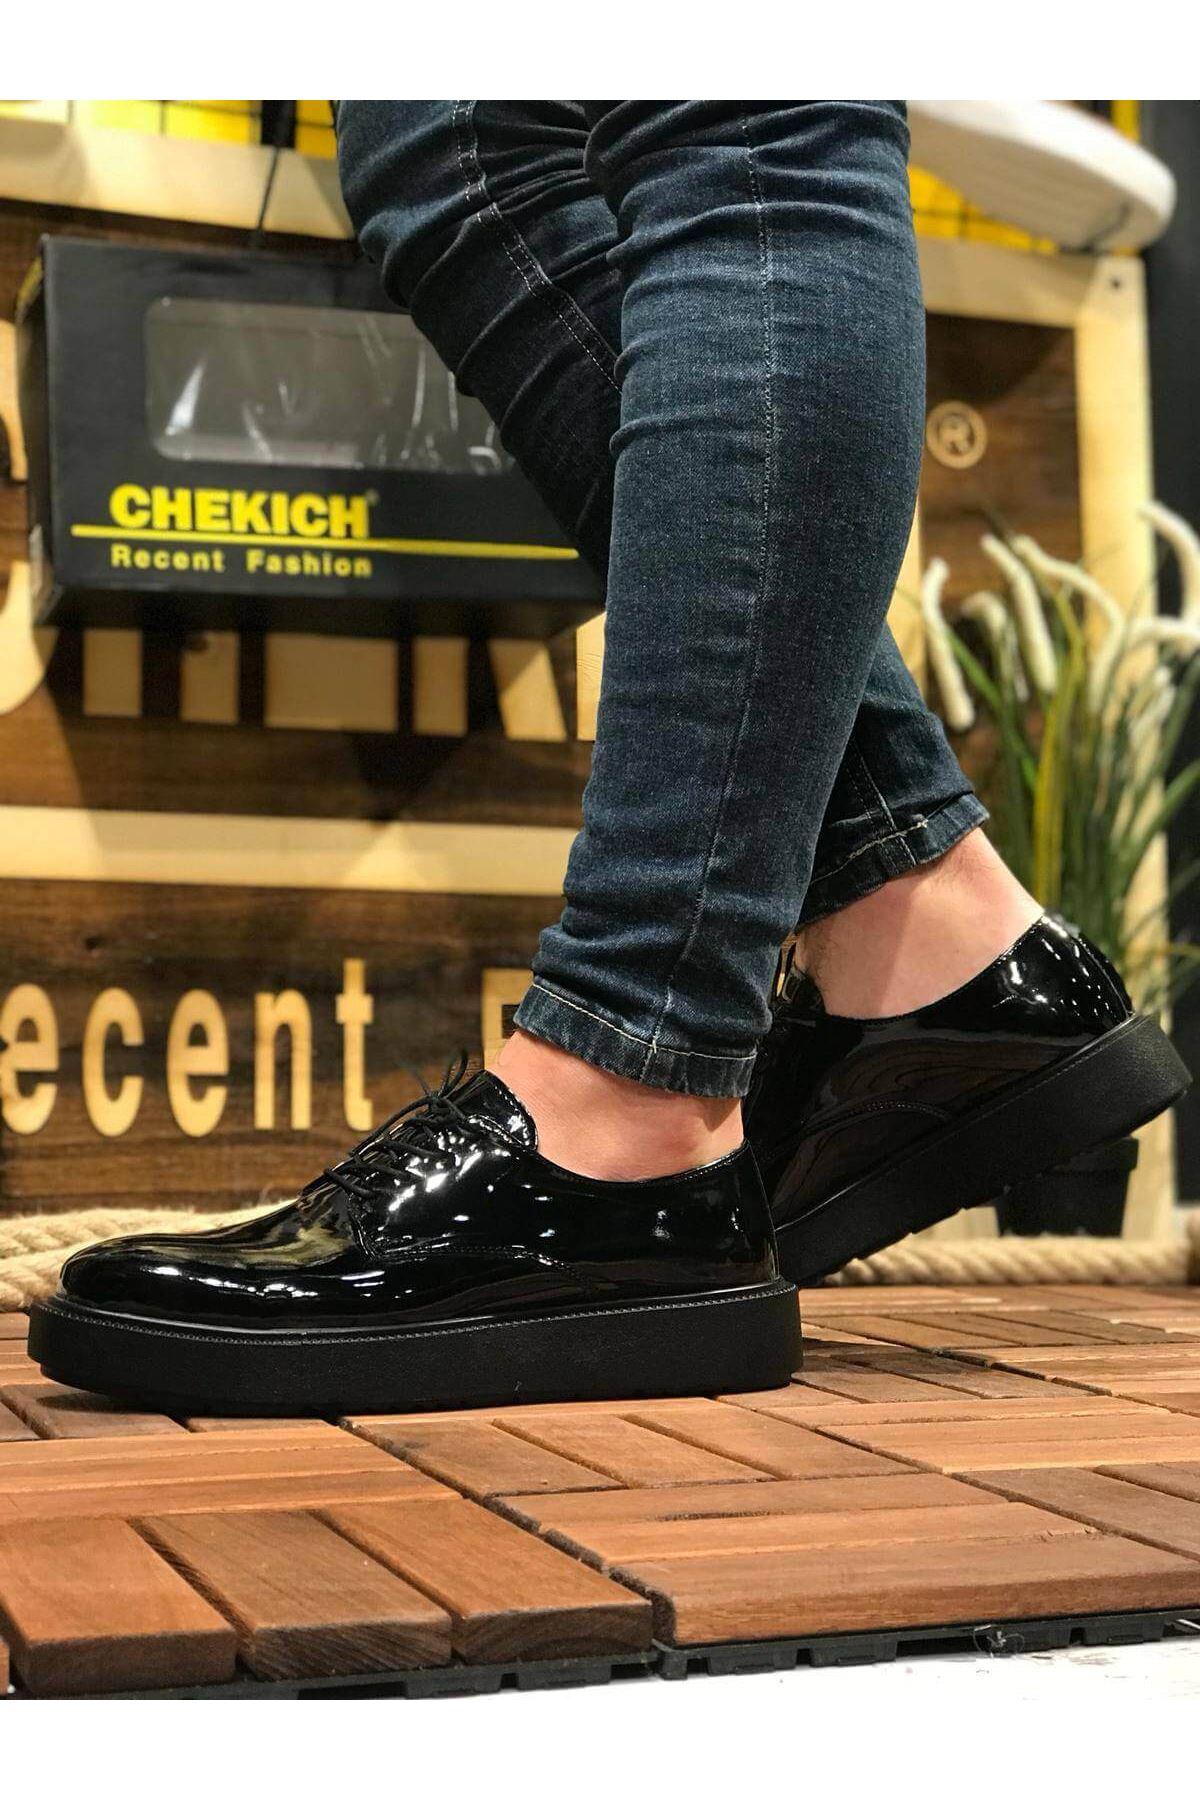 Chekich CH001 Rugan Siyah Taban Erkek Ayakkabı SIYAH